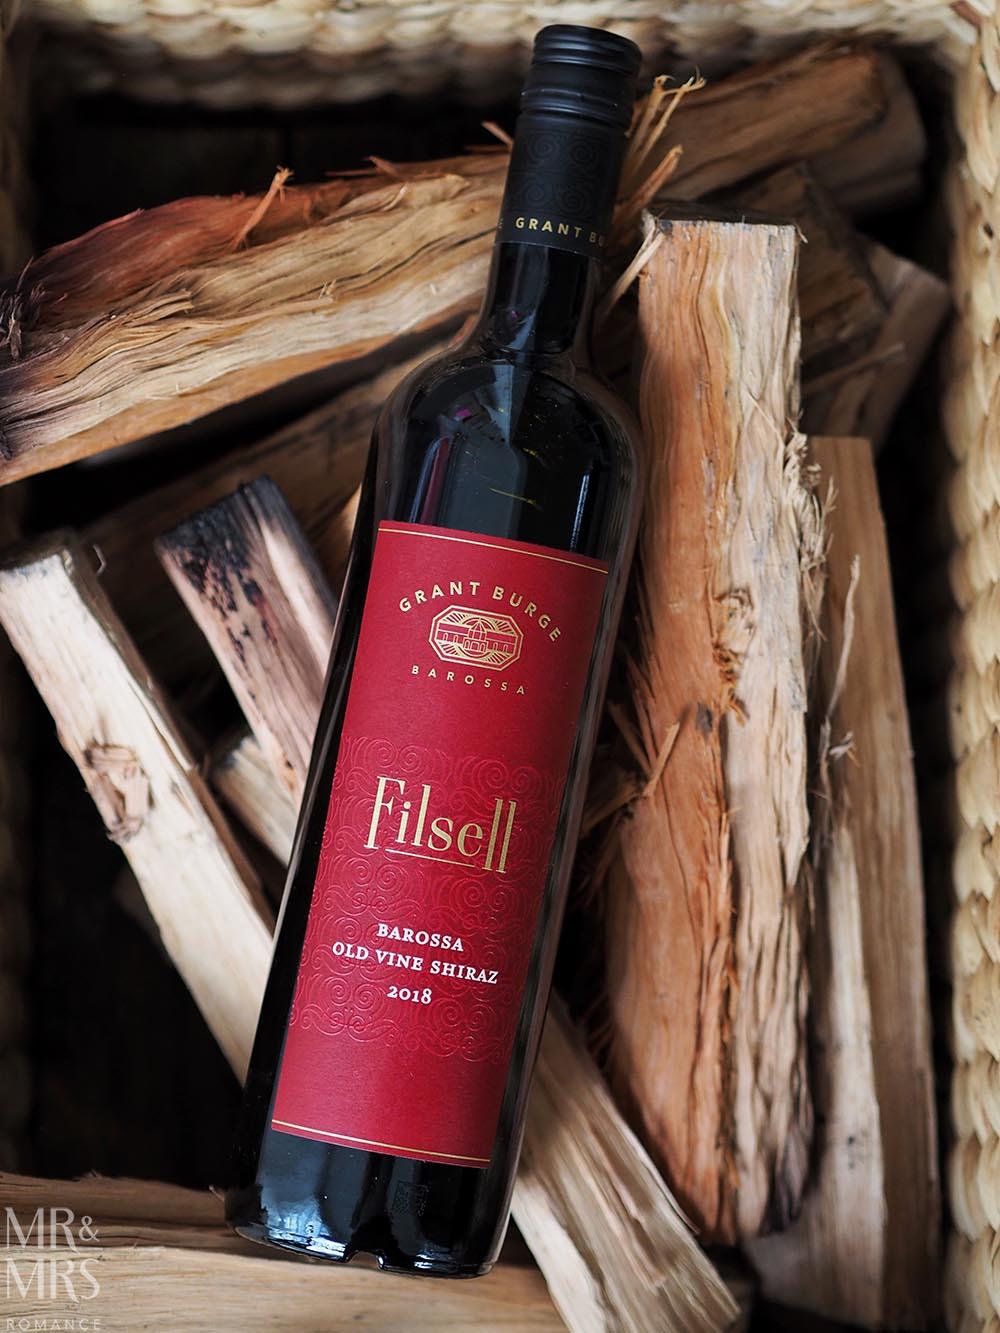 Wine tasting - Grant Burge Filsell Shiraz